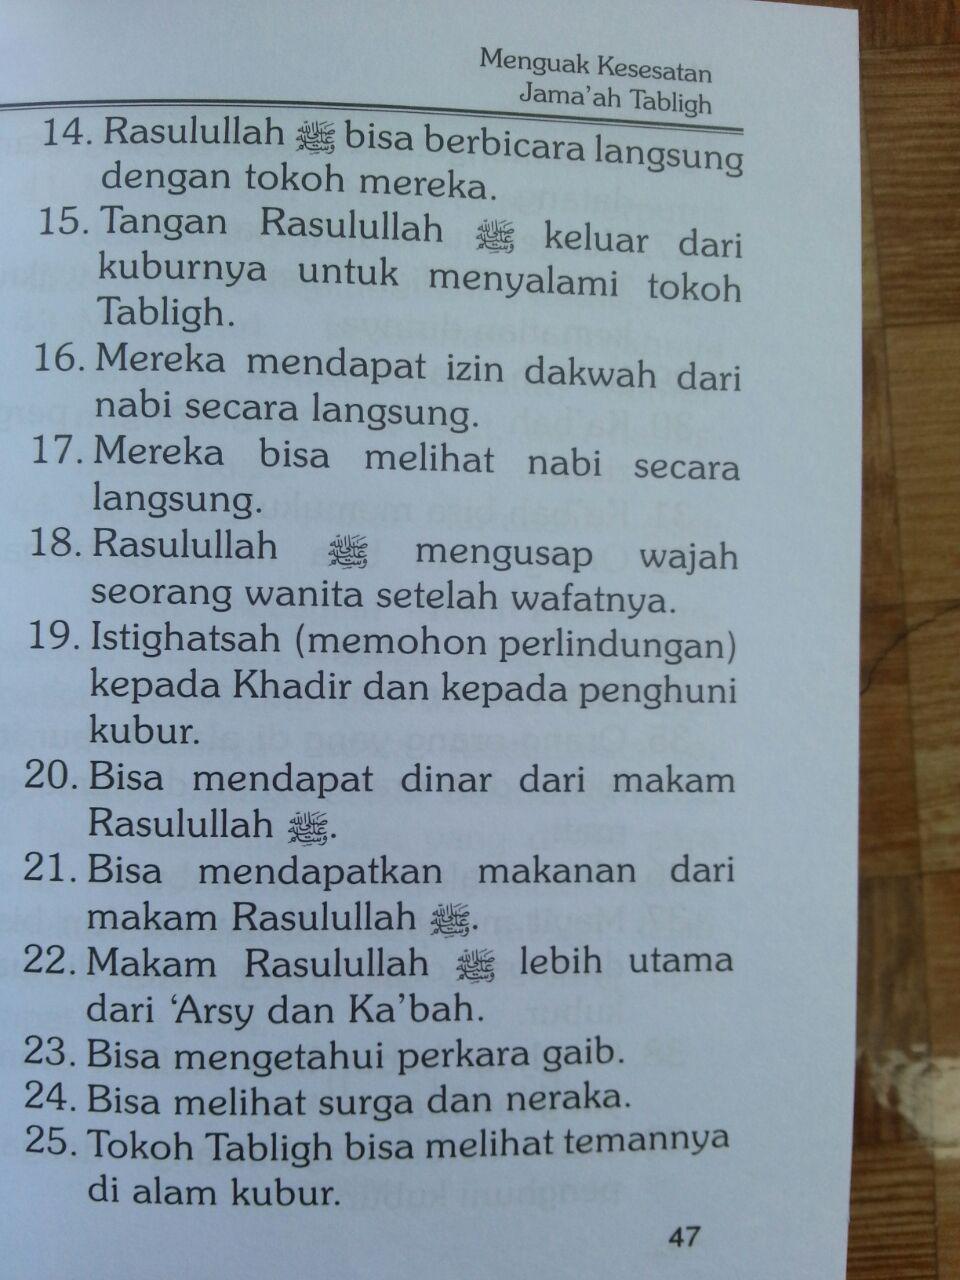 Buku Jamaah Tabligh Kenyataan Dan Pengakuan isi 3